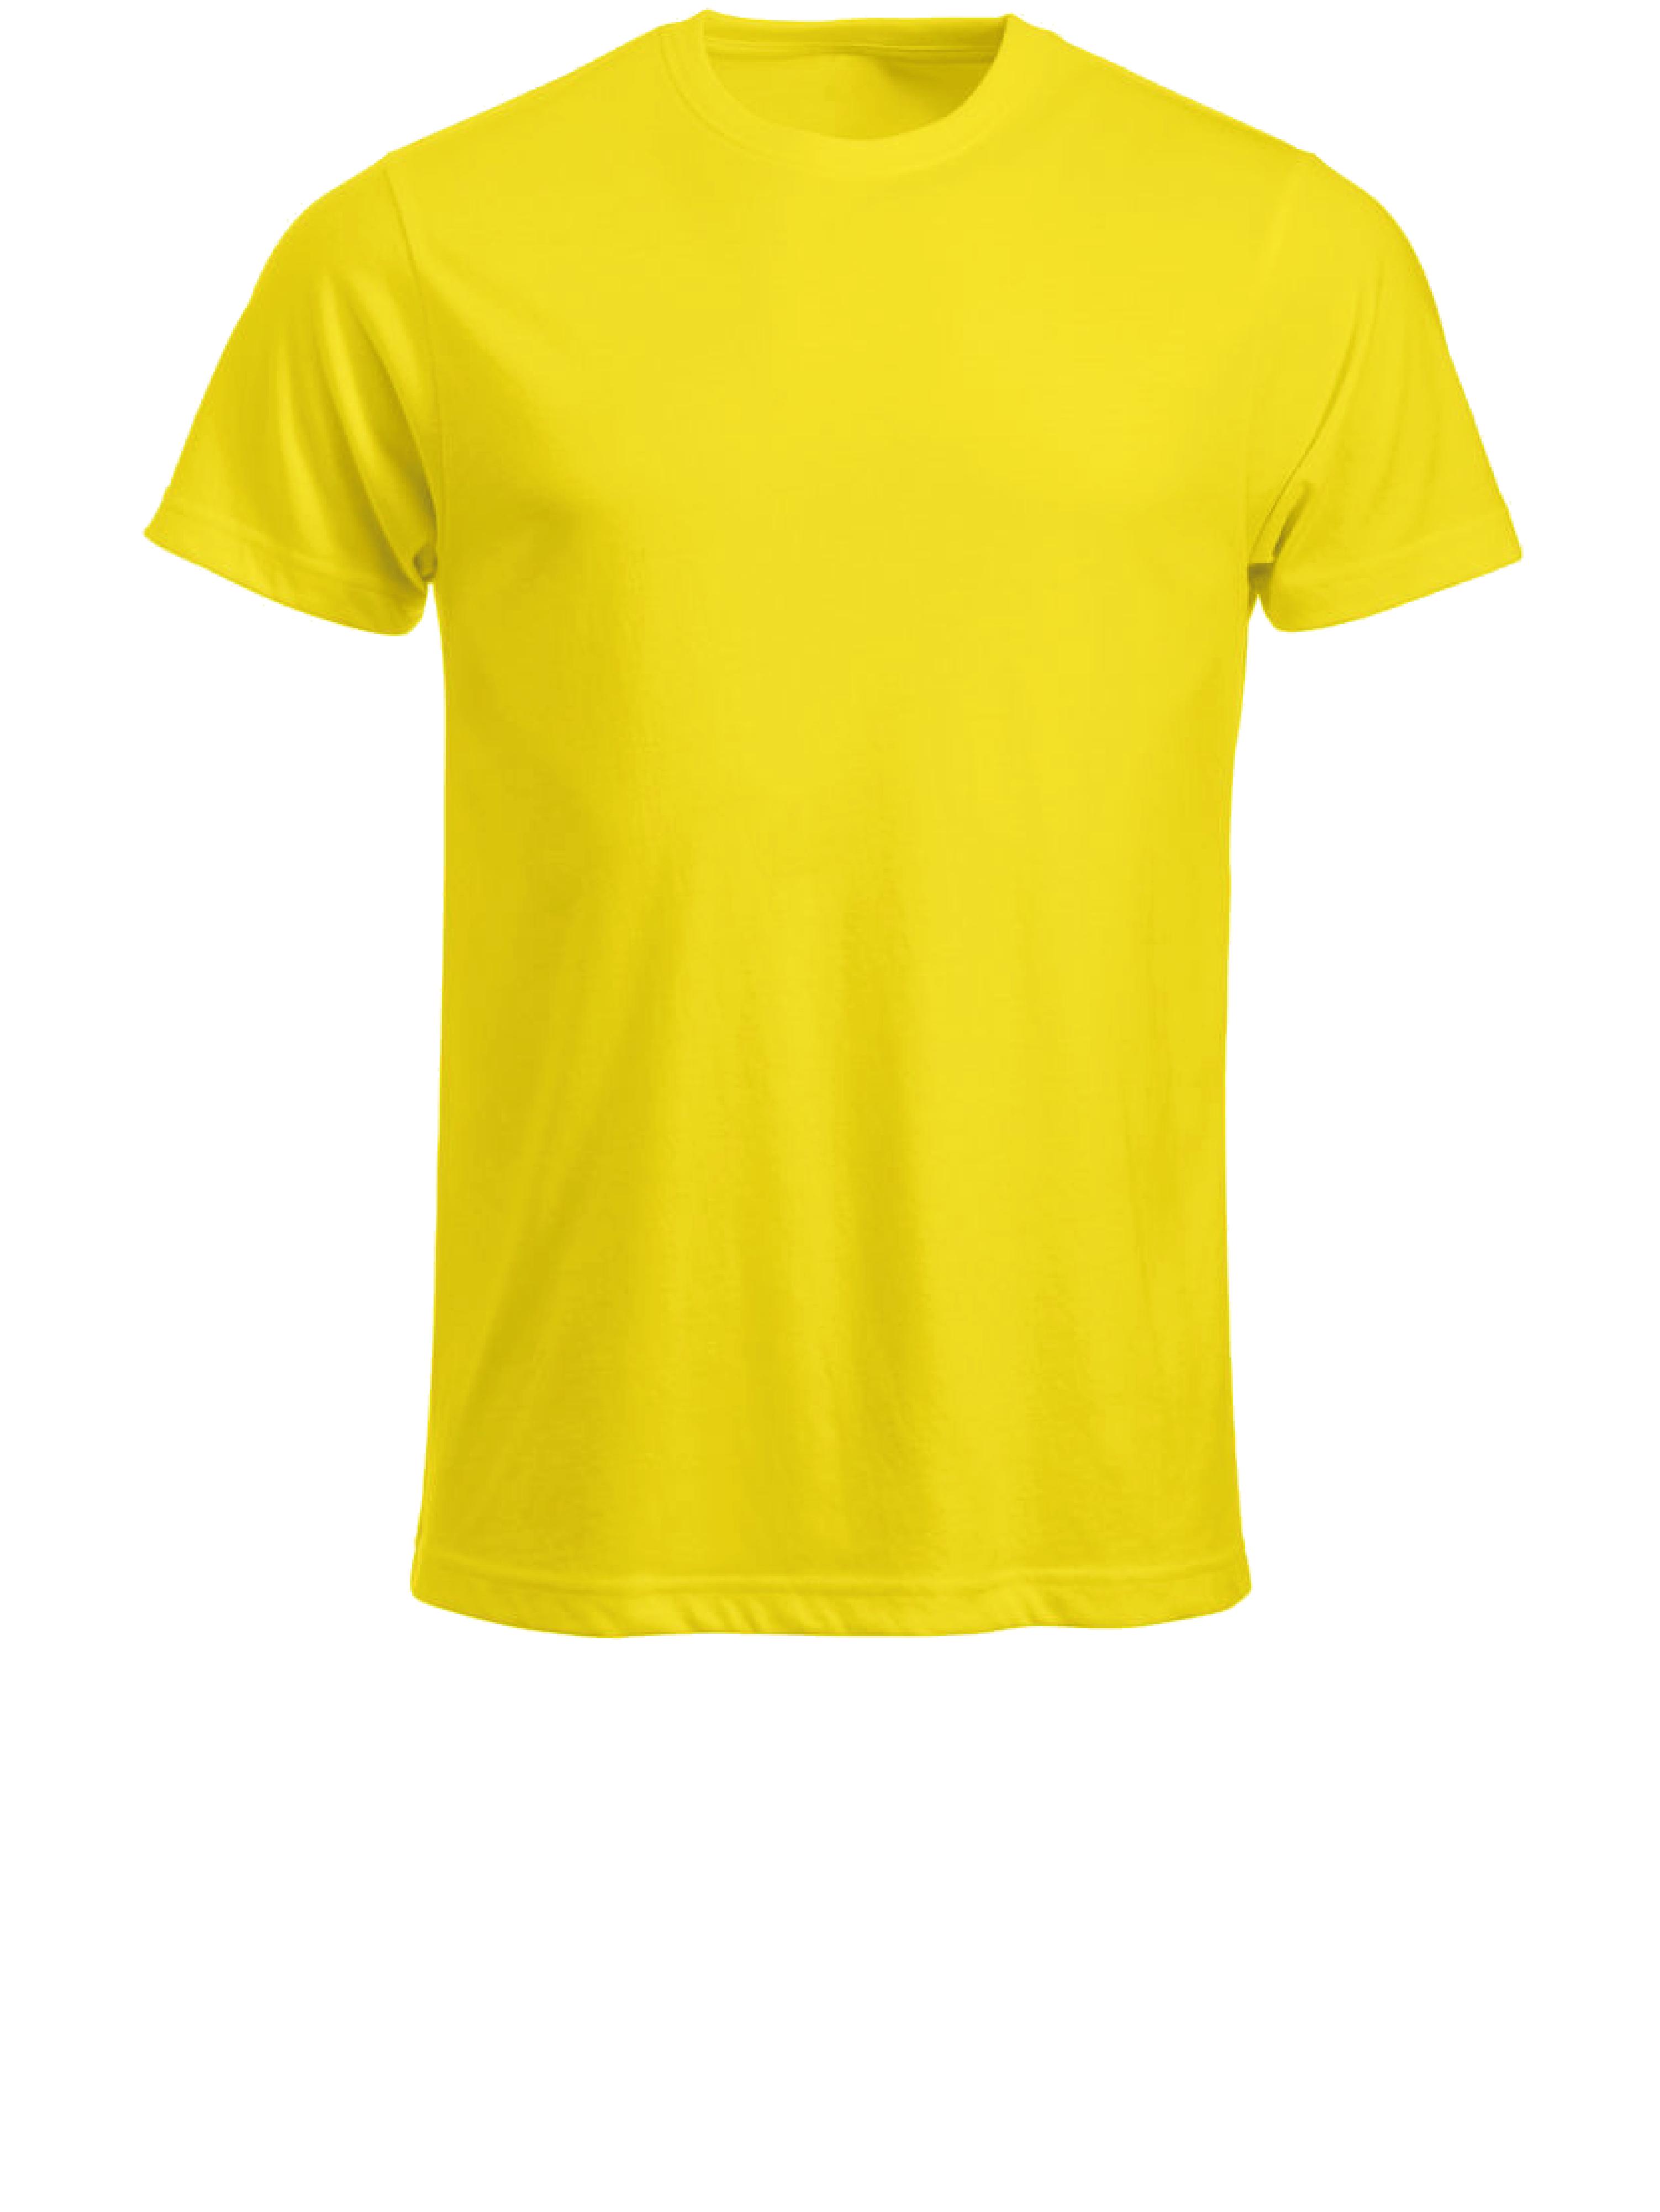 shirt gelb-01.png